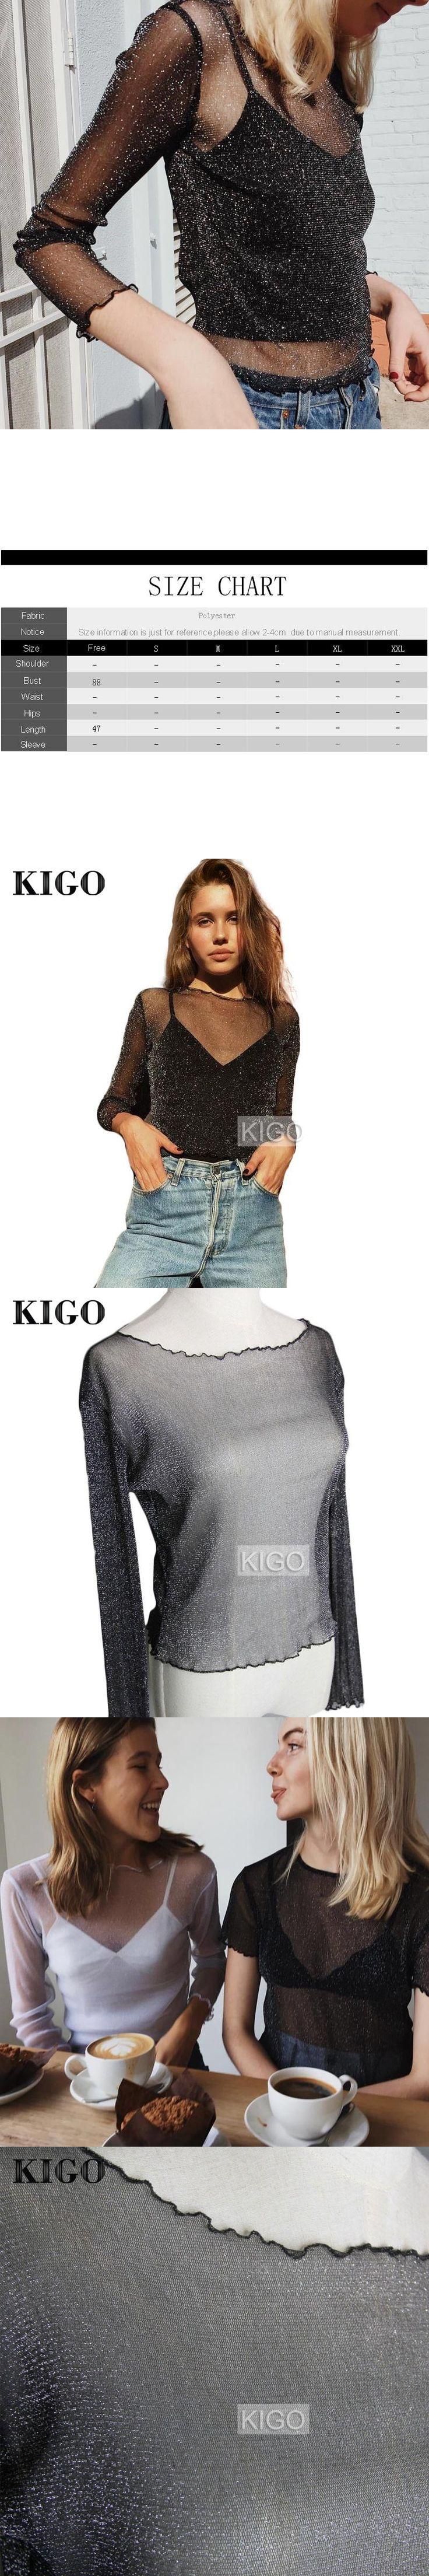 KIGO Summer Women Blouse 2017 Fashion Silver Glitter Top Long Sleeve Sexy See Through Metallic Blouse Women Tops KF0967H